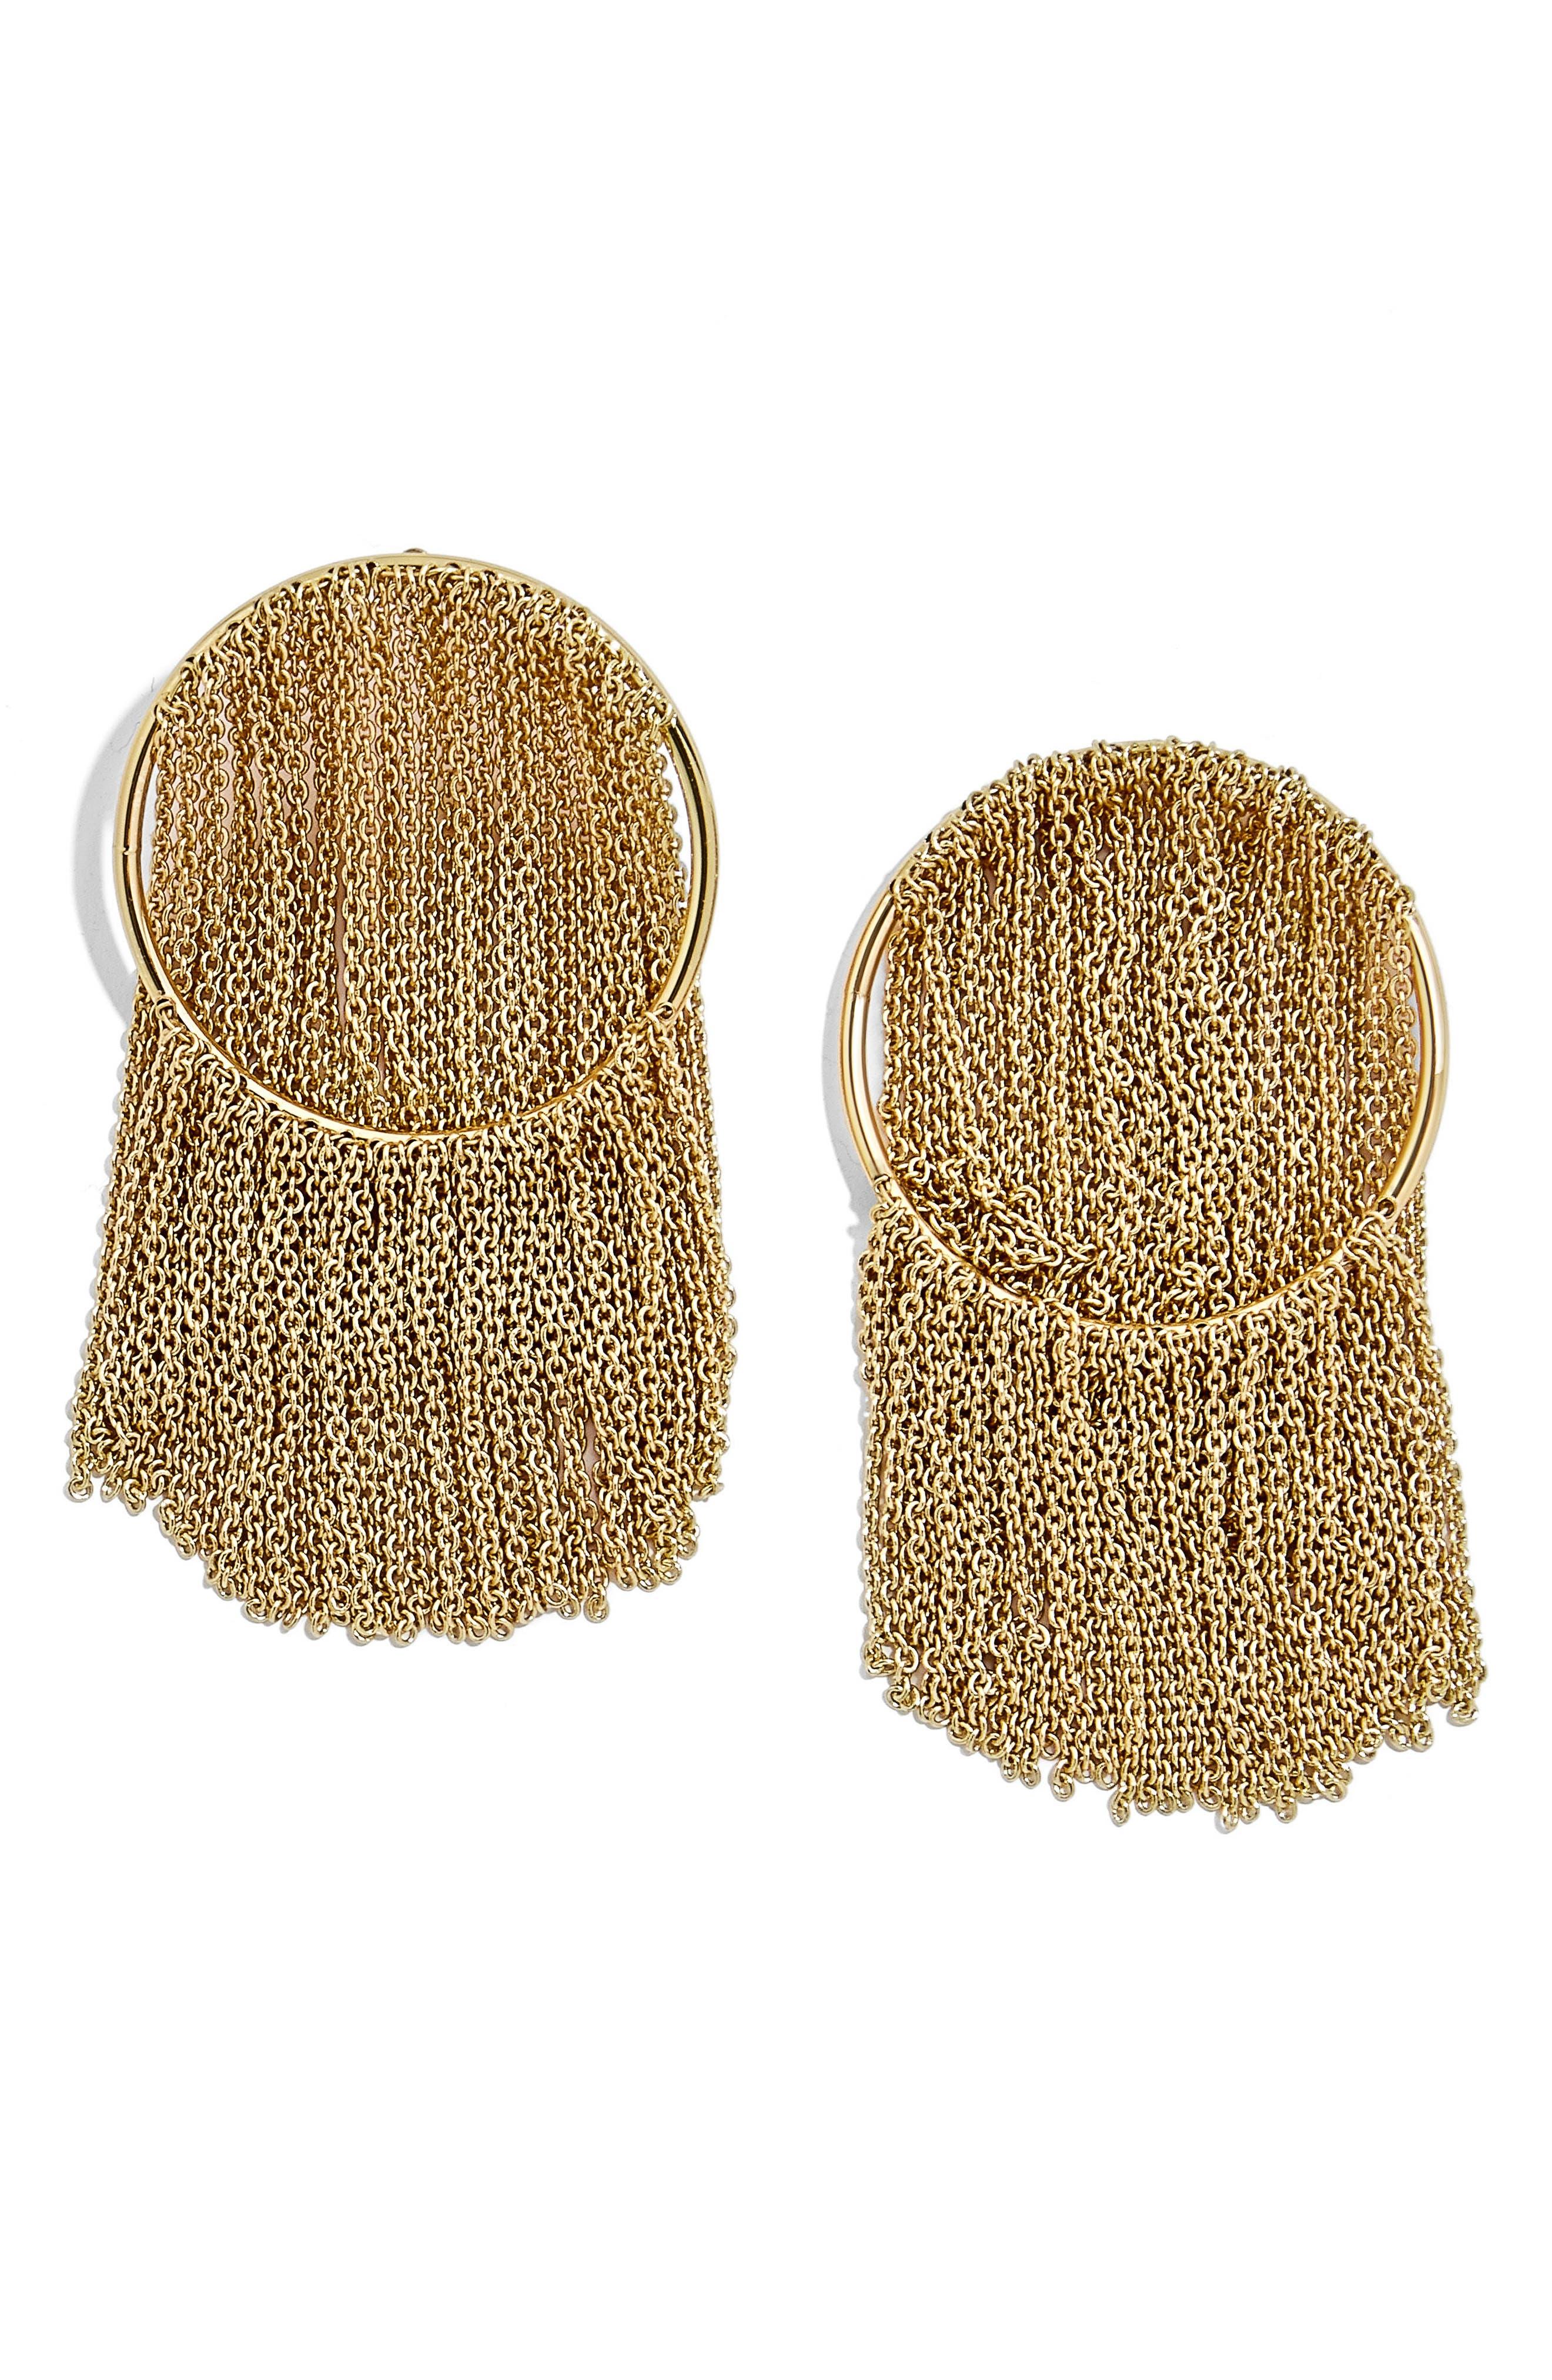 Angelita Chain Waterfall Hoop Earrings,                         Main,                         color, Gold